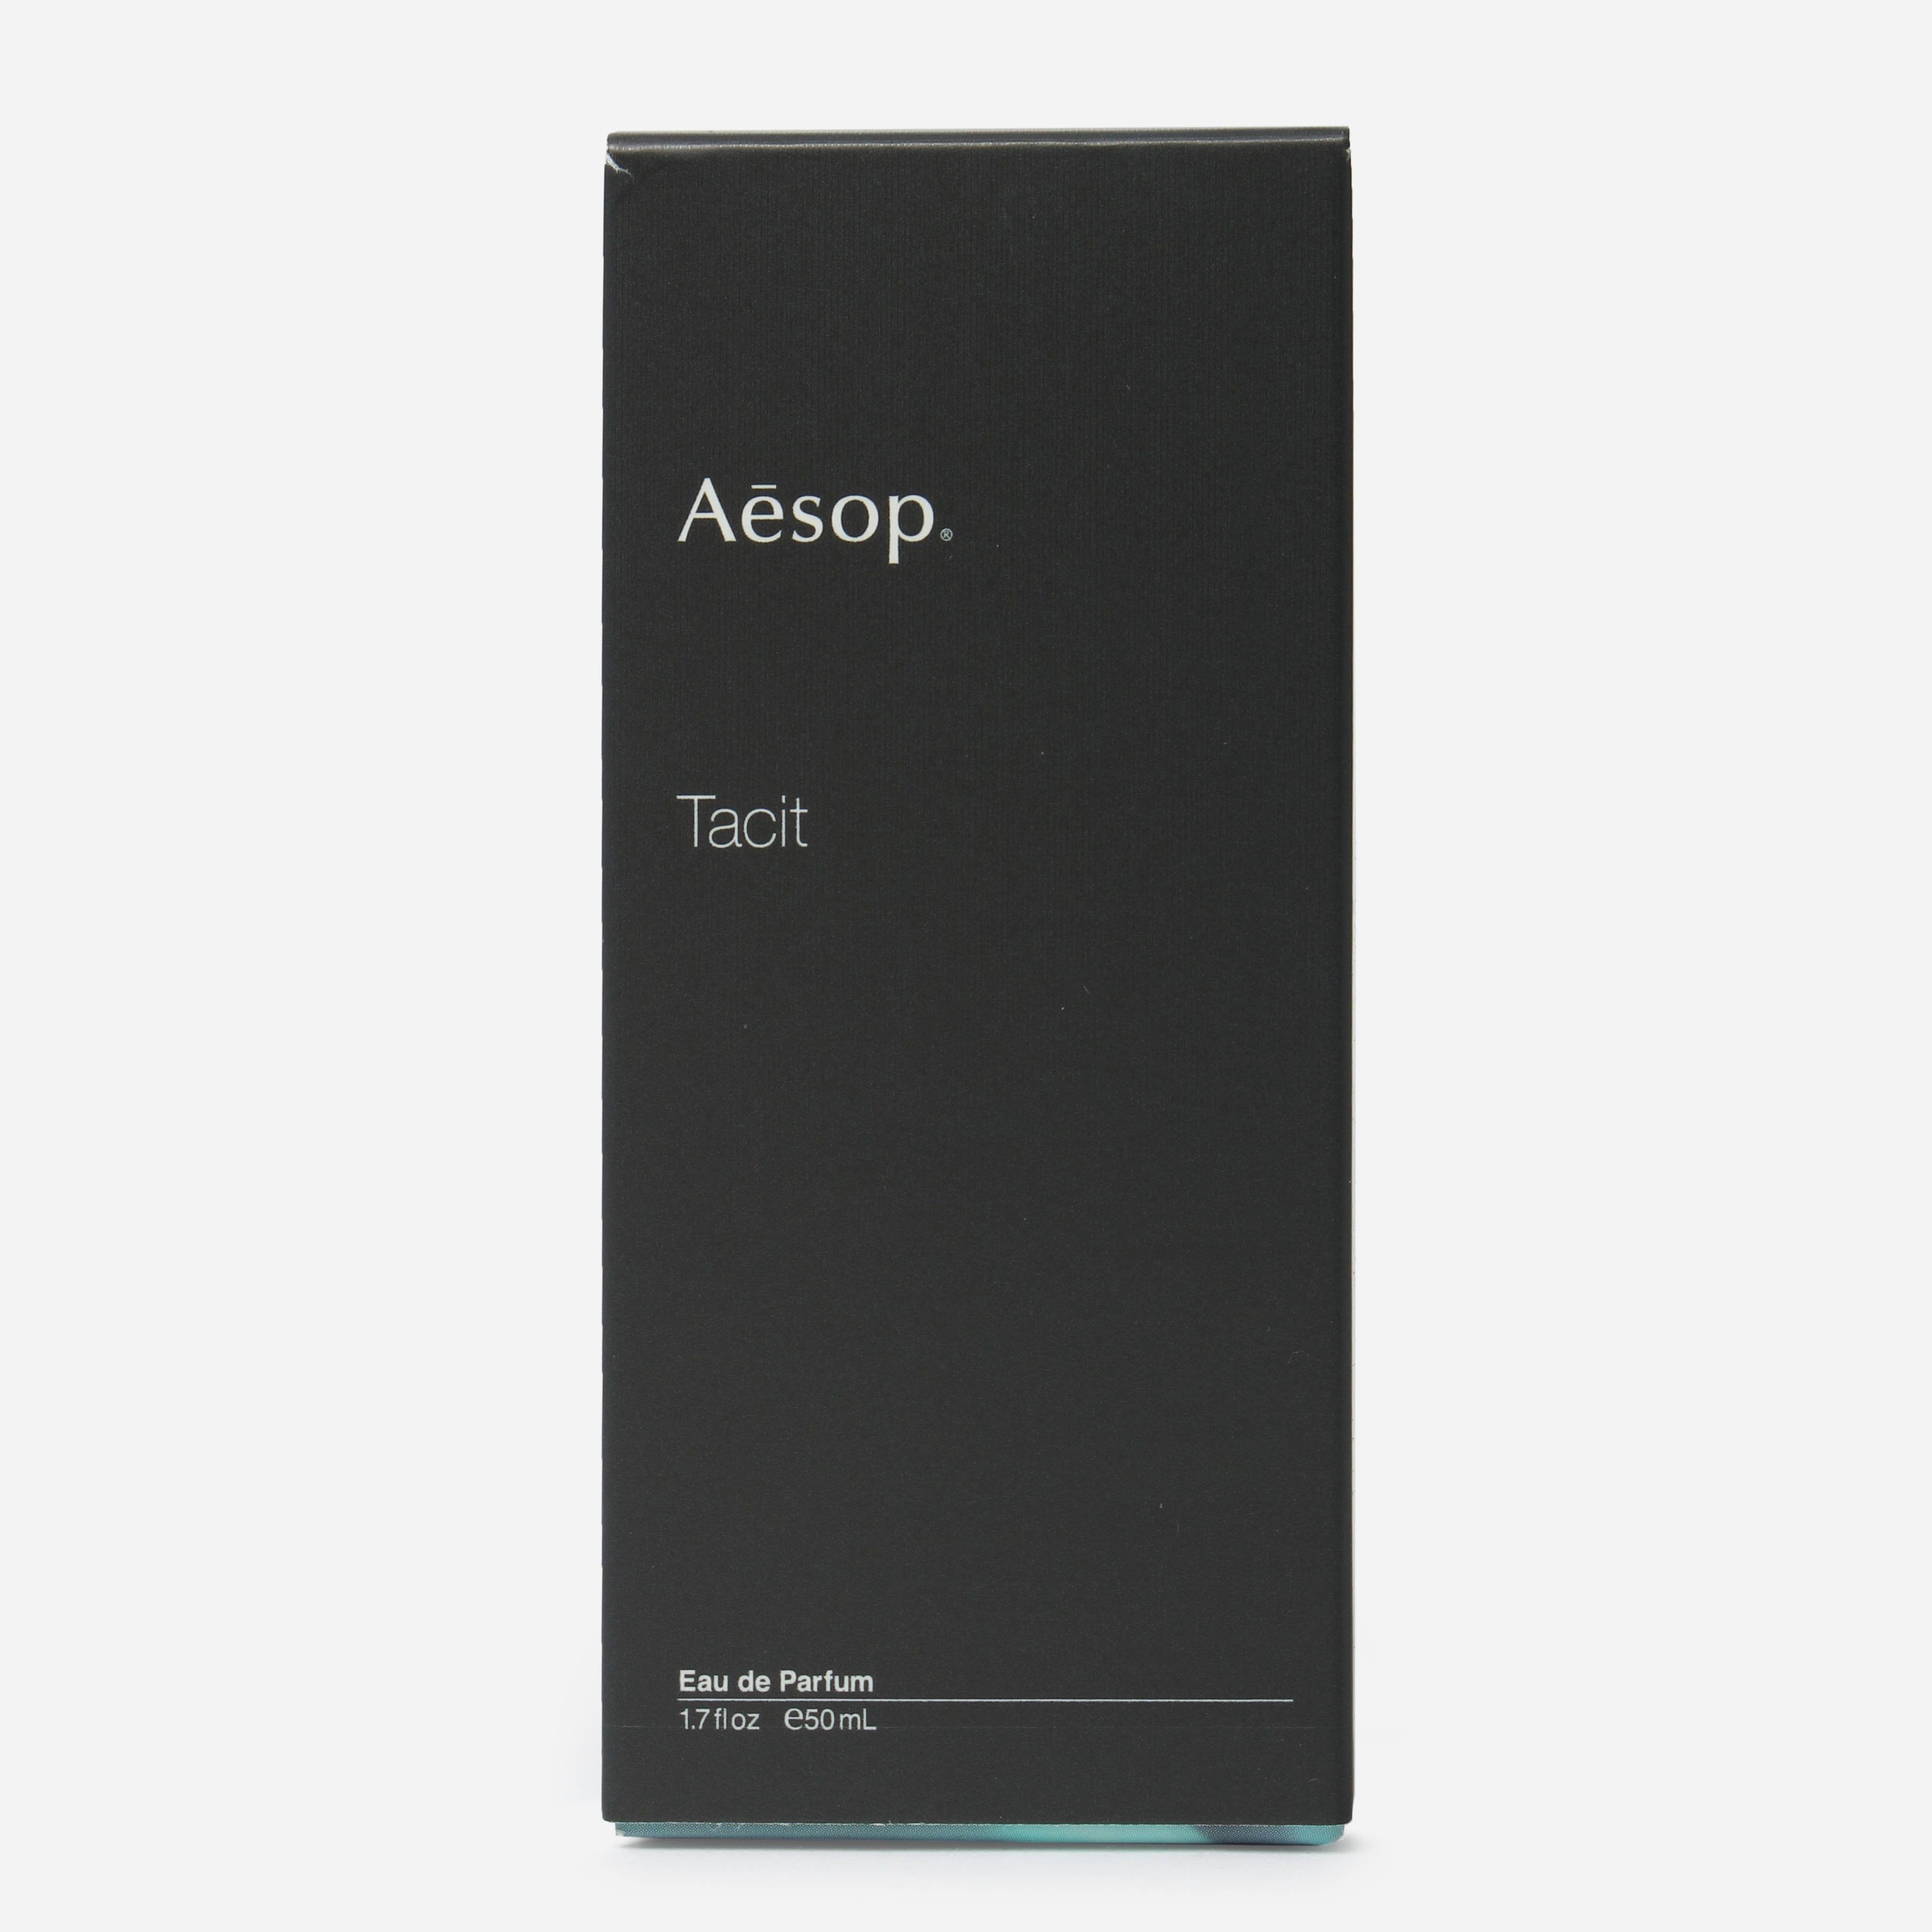 Aesop AFR12 TACIT 50ML